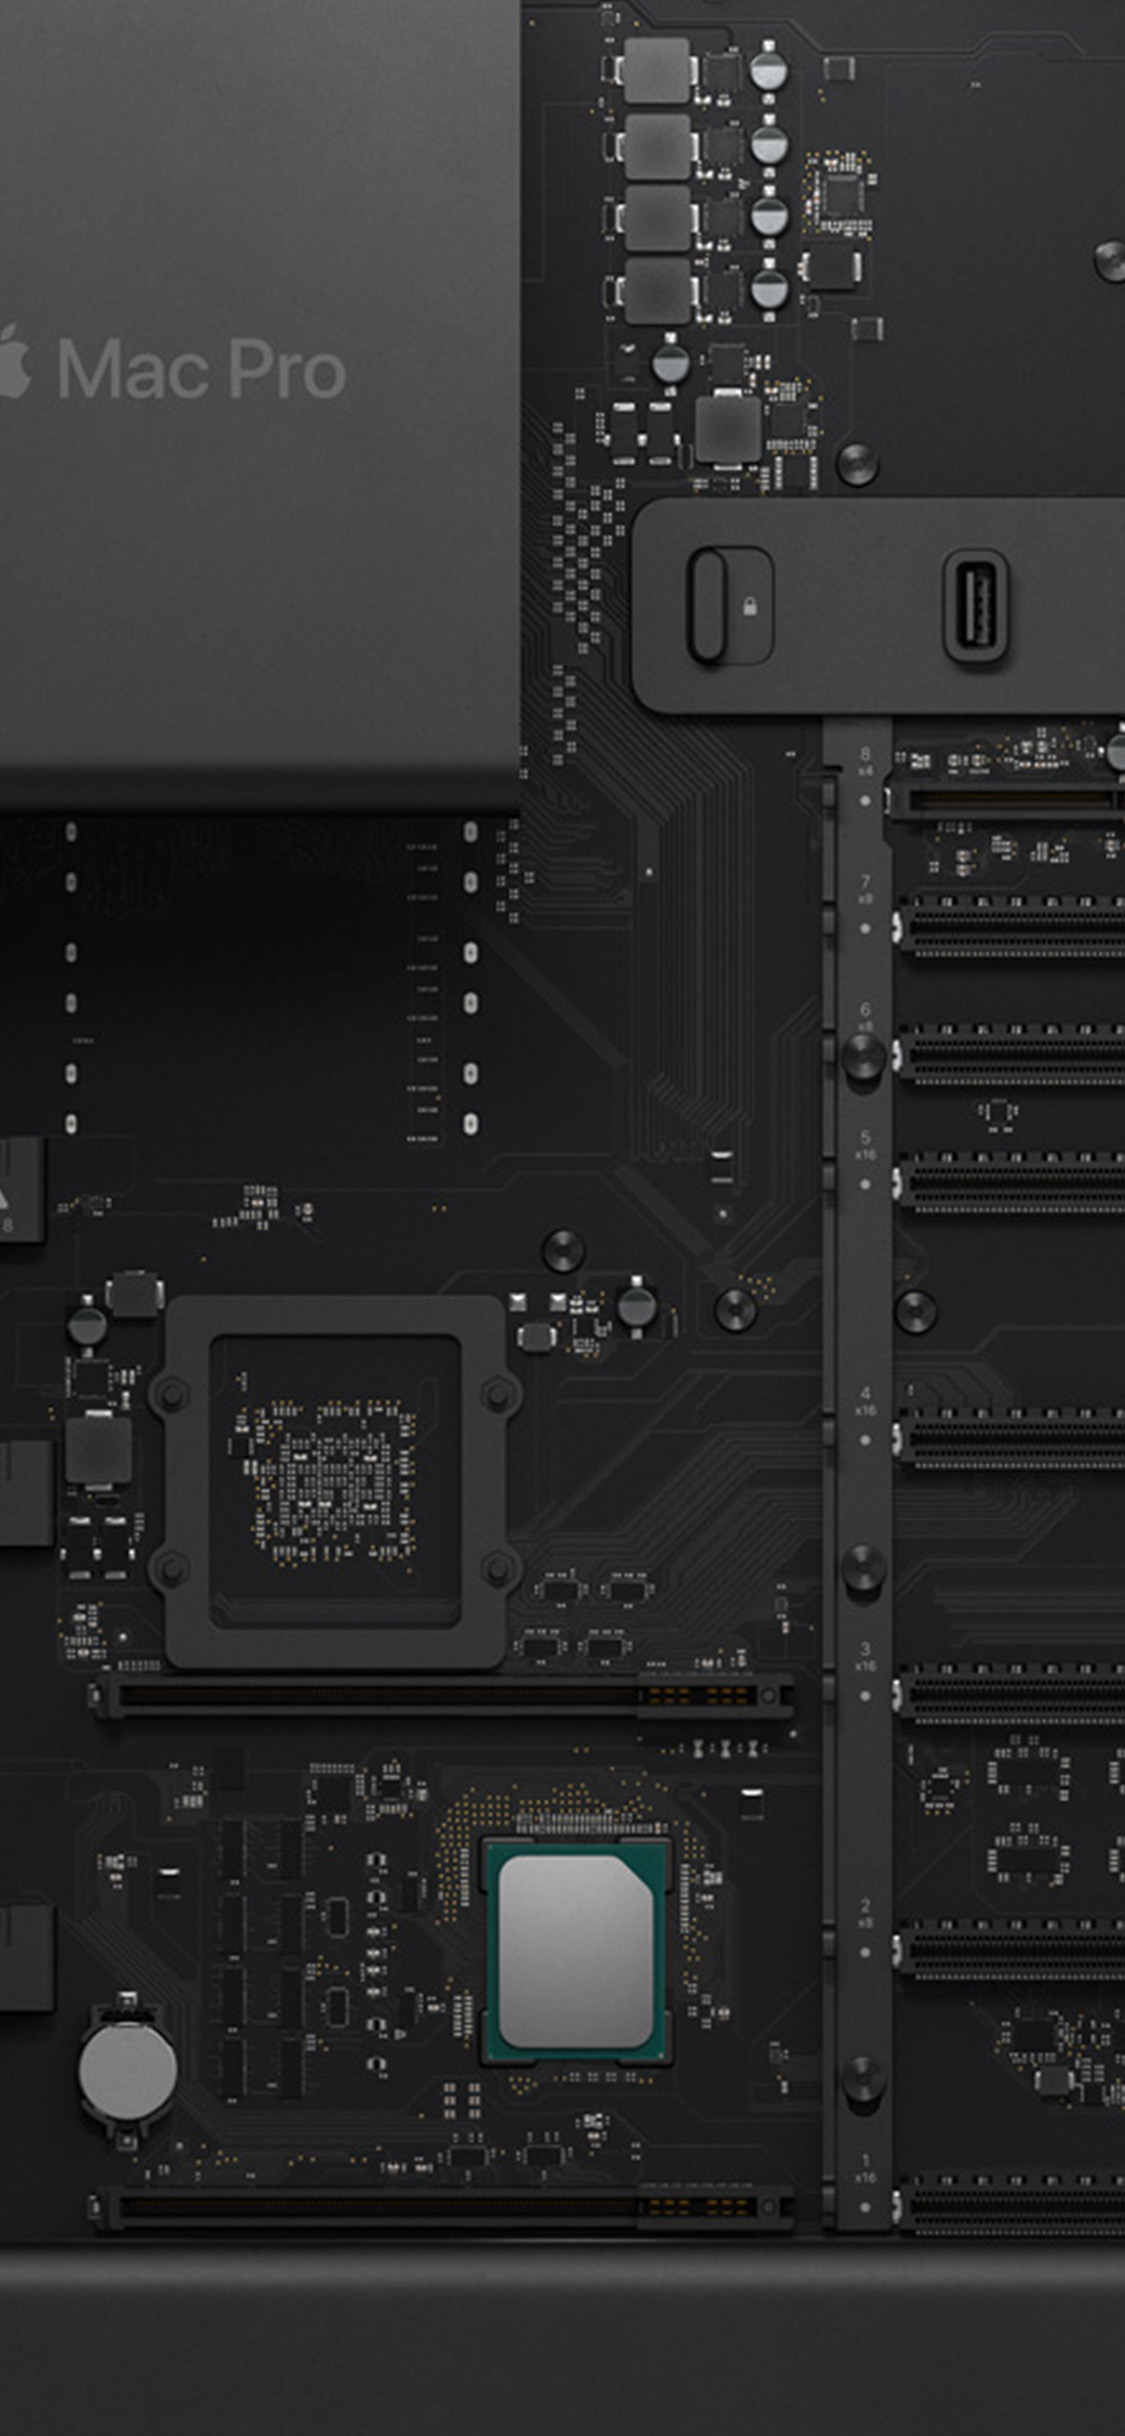 Iphonexpapers Com Iphone X Wallpaper Bj08 Mac Pro Inside Apple Art